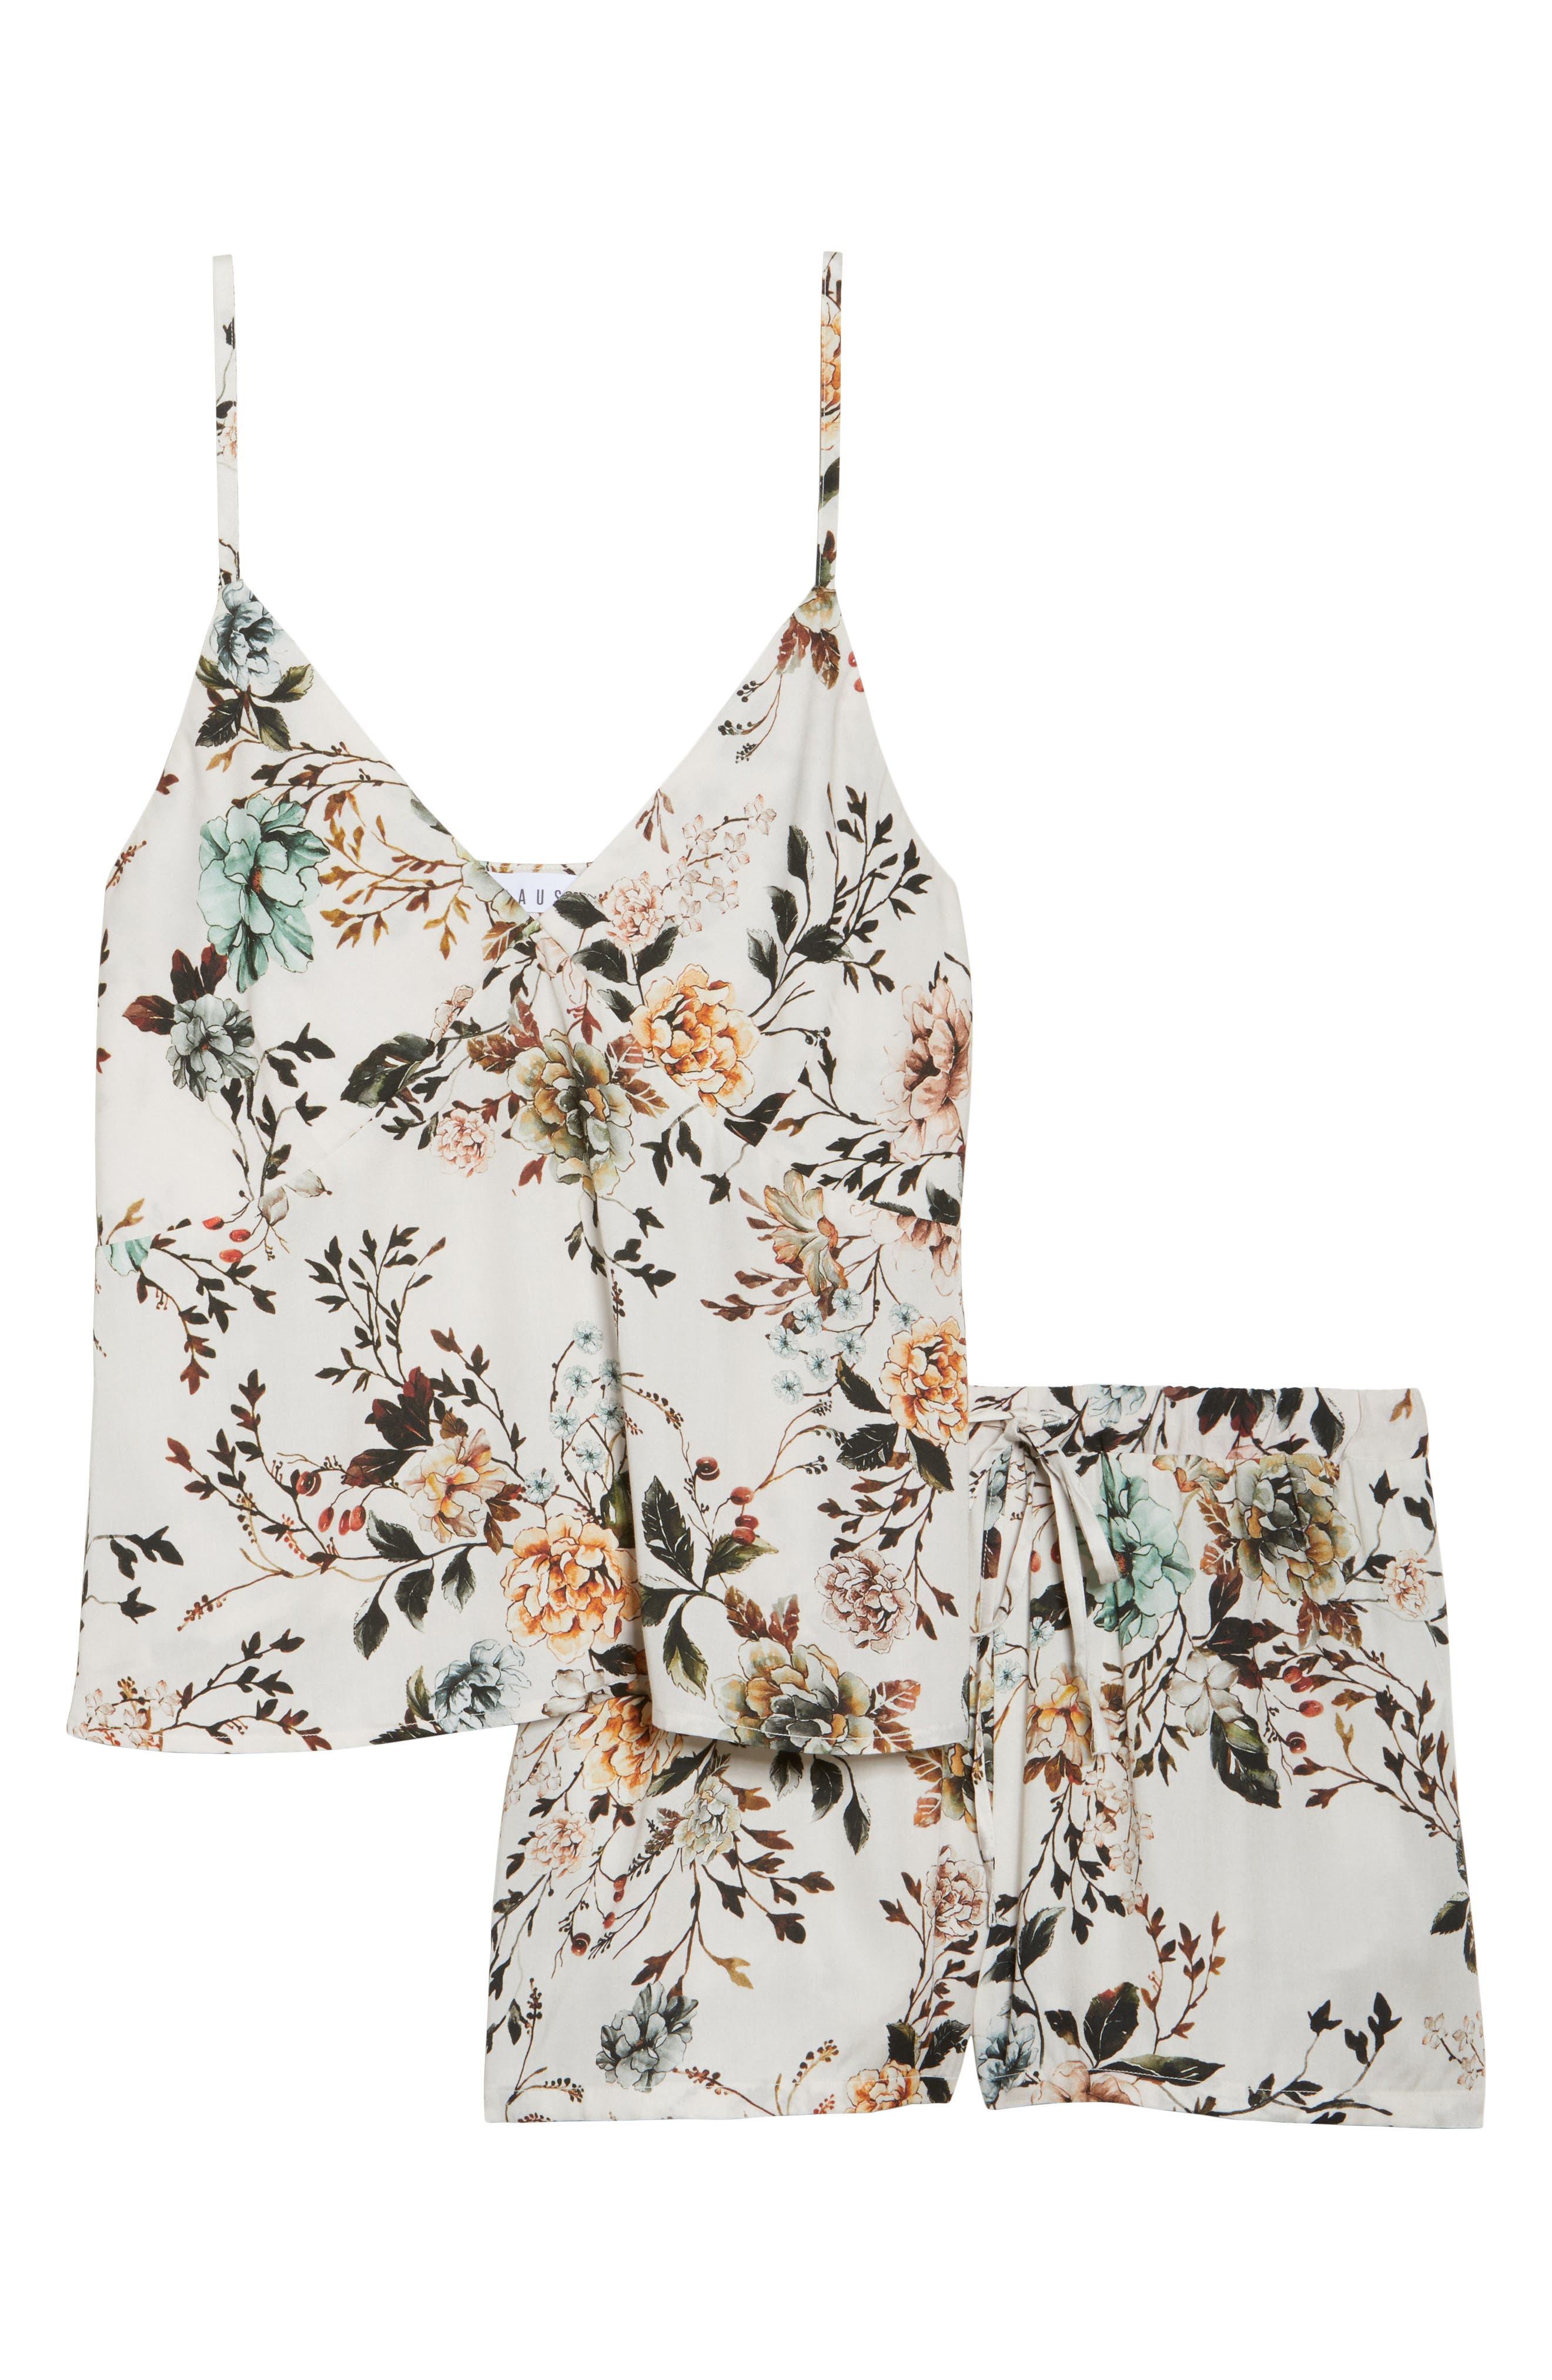 Floral Poppy Short & Camisole Pajamas,                             Alternate thumbnail 4, color,                             Cream Dusk